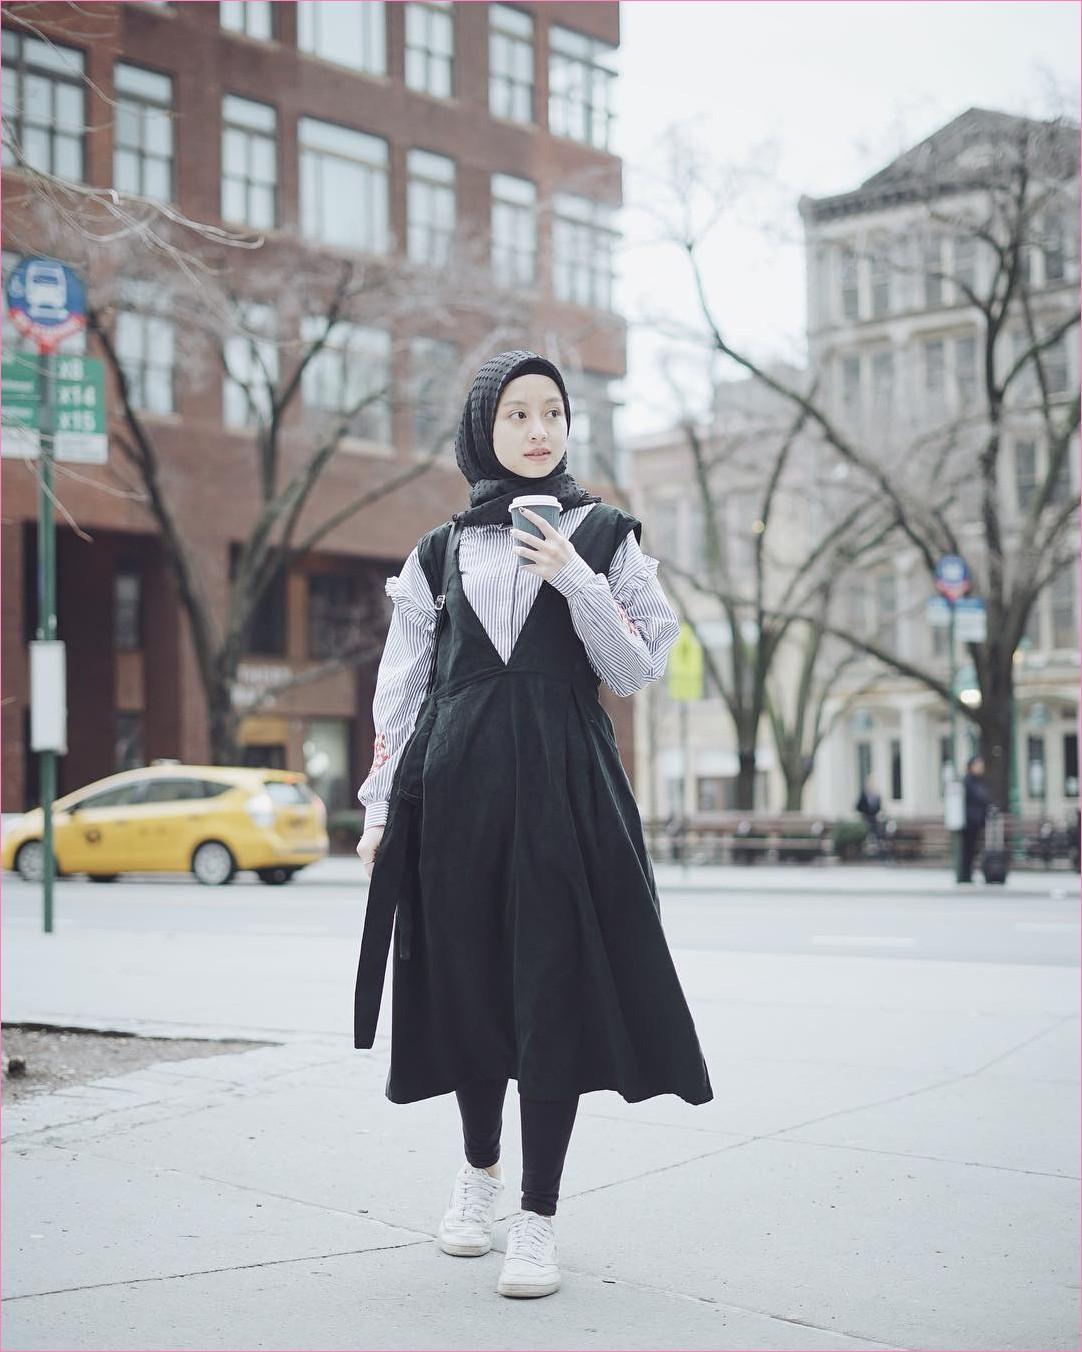 Mix And Match Outfit Baju Luaran (Inner) 2018 Ala Selebgram overall slip dress hitam legging kemeja top blouse stripes segiempat hijab square ruby ciput rajut totebags kets sneakers putih coffe london ootd trendy gedung winter salju